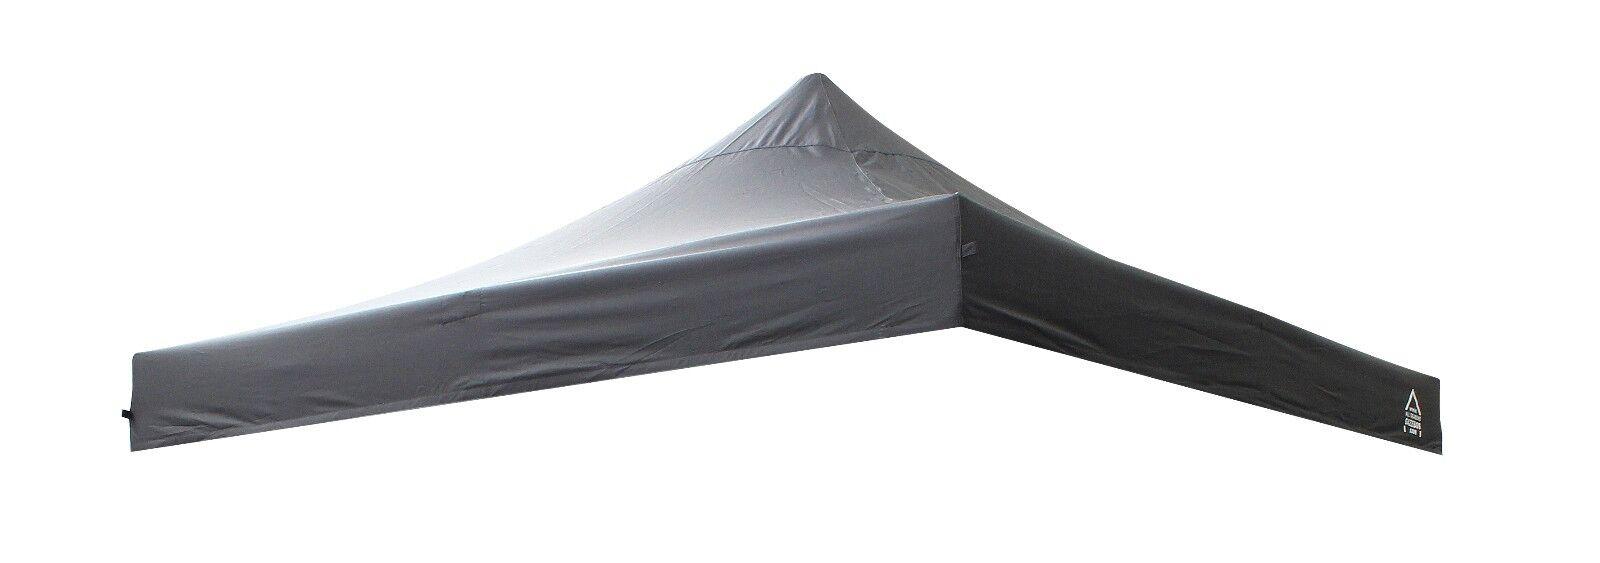 2x2 3x3 3x4.5 3x6 Heavy Duty completo impermeable Pop-Up Gazebo Techo de Repuesto